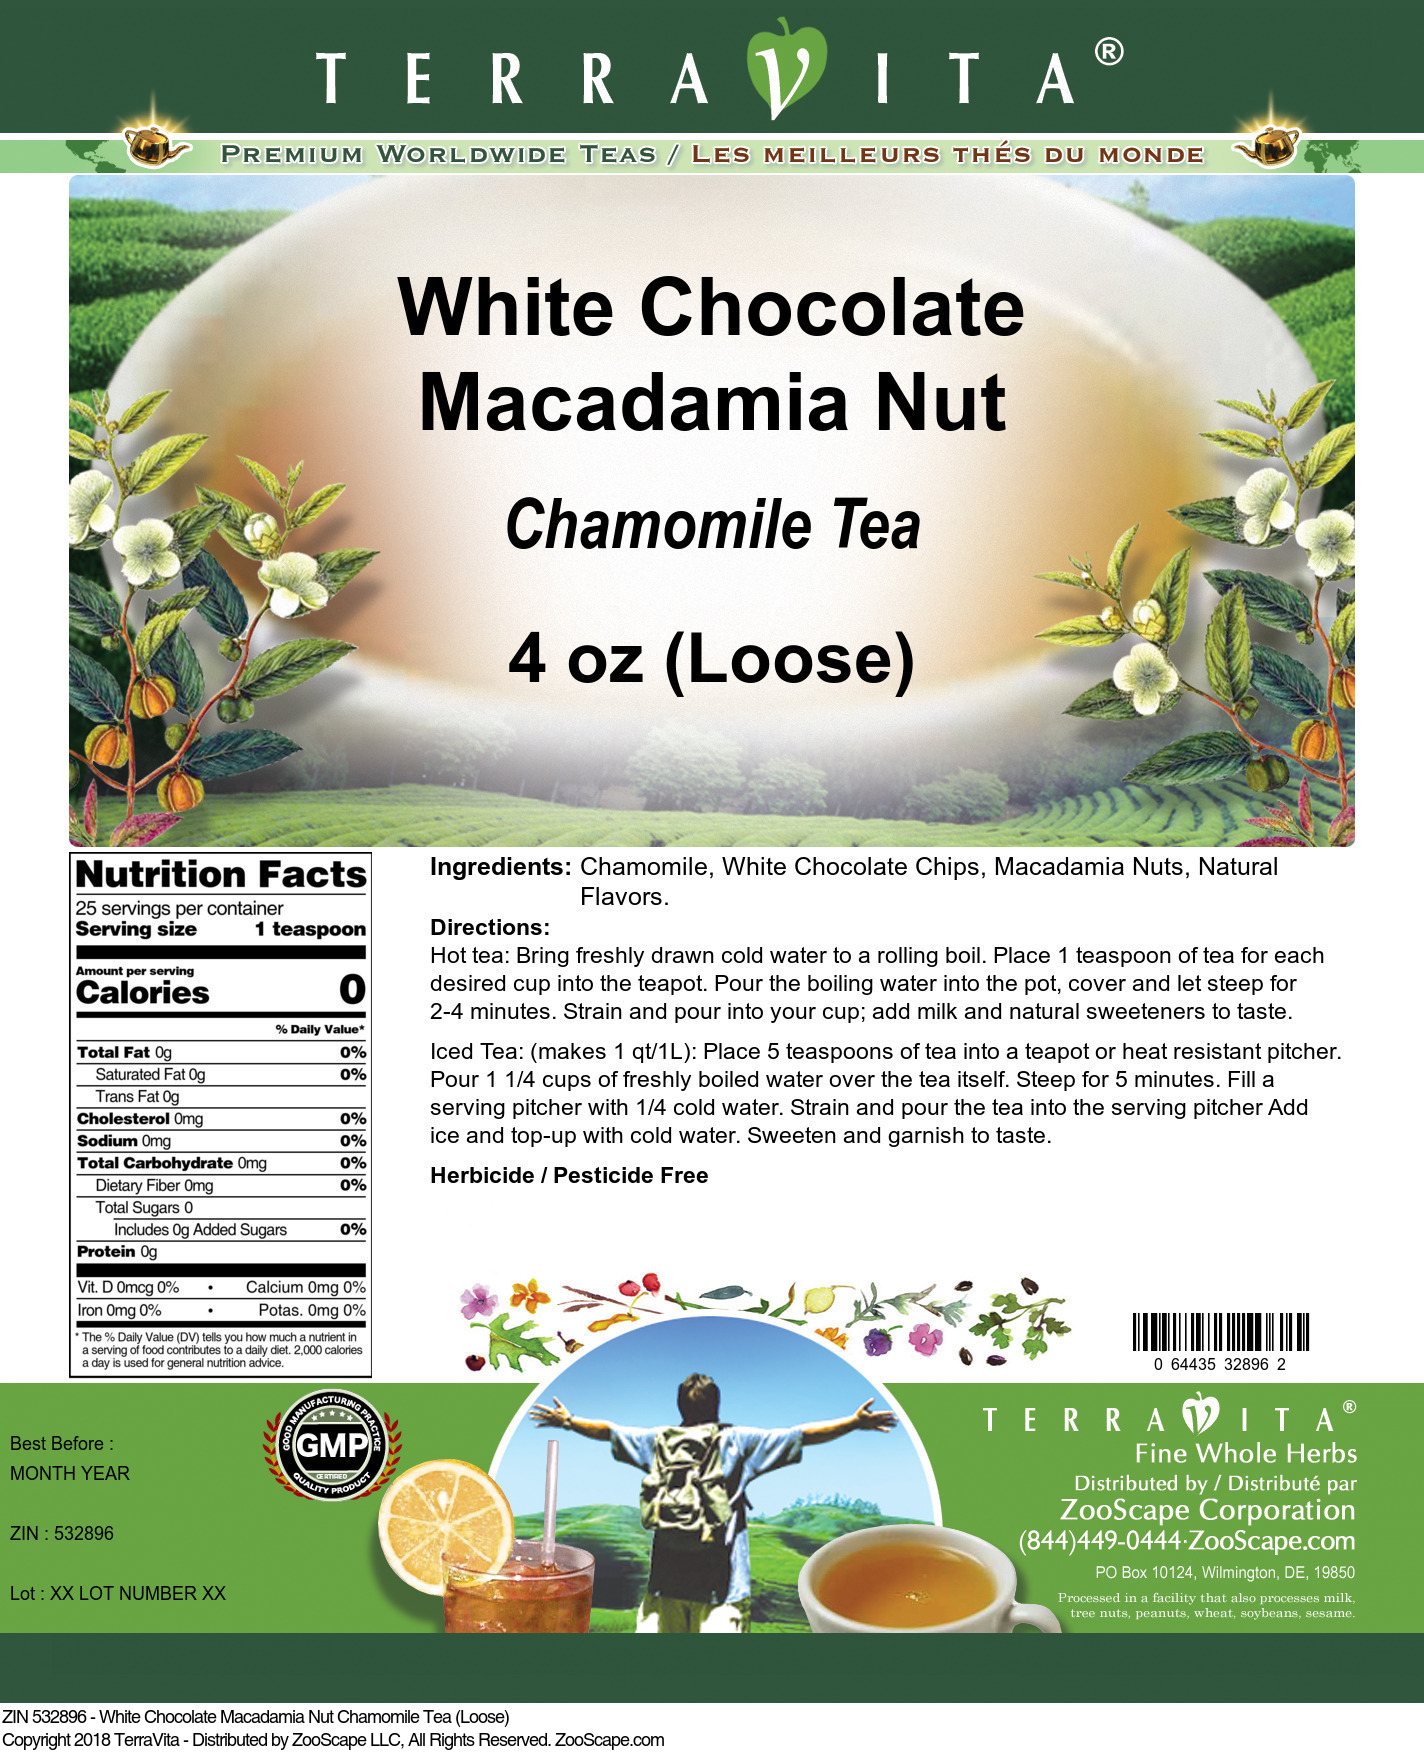 White Chocolate Macadamia Nut Chamomile Tea (Loose)